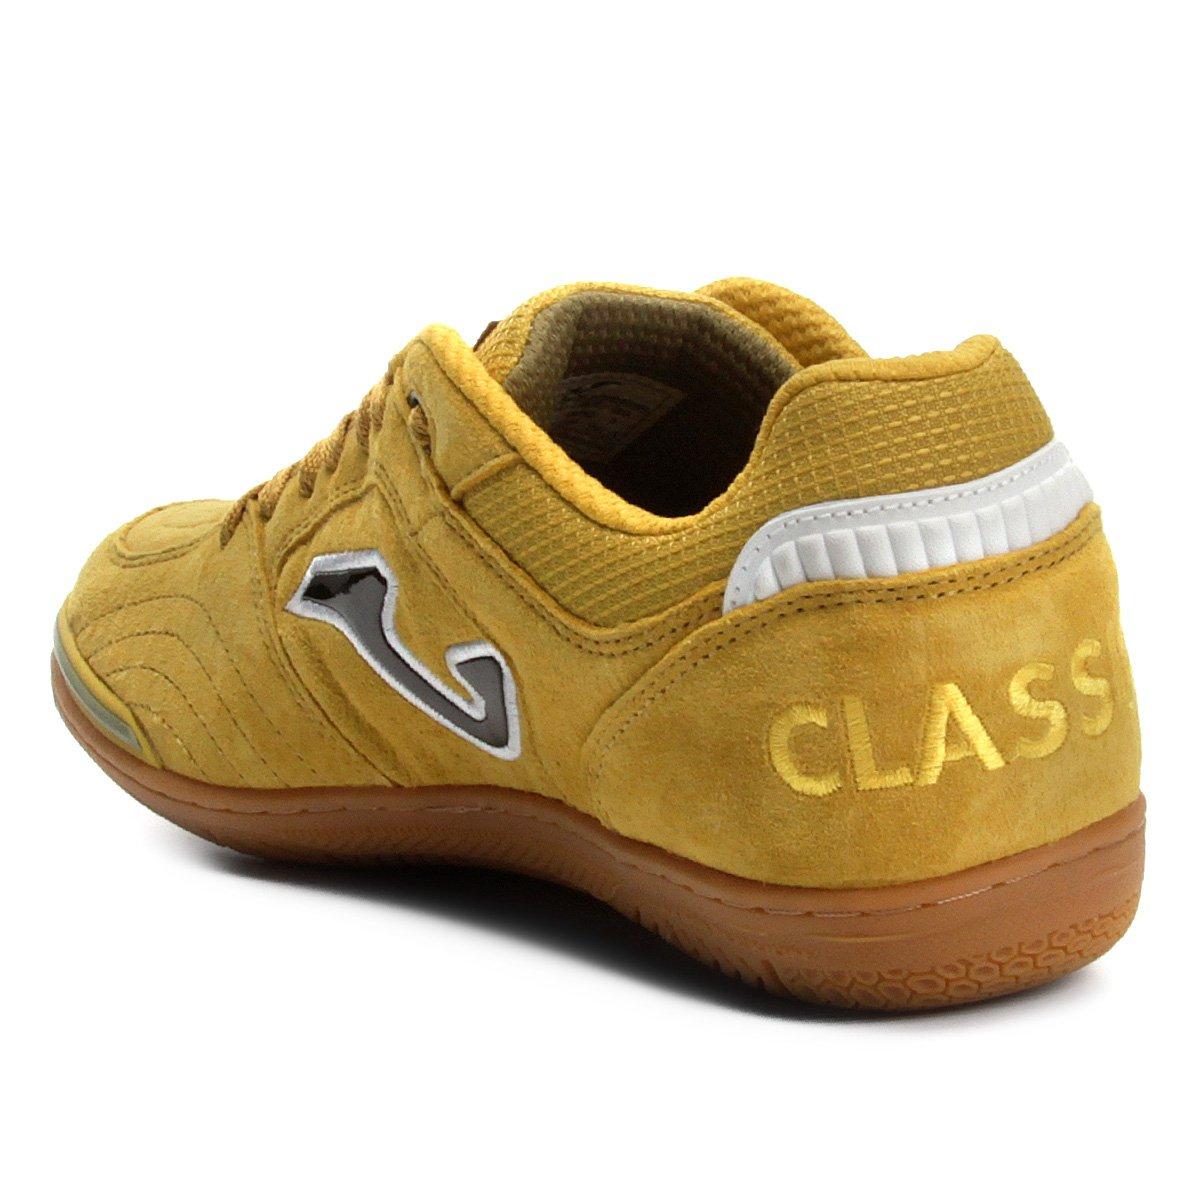 Chuteira Futsal Joma Classic Nobuck IN - Amarelo - Compre Agora ... 1dbd29f518a65